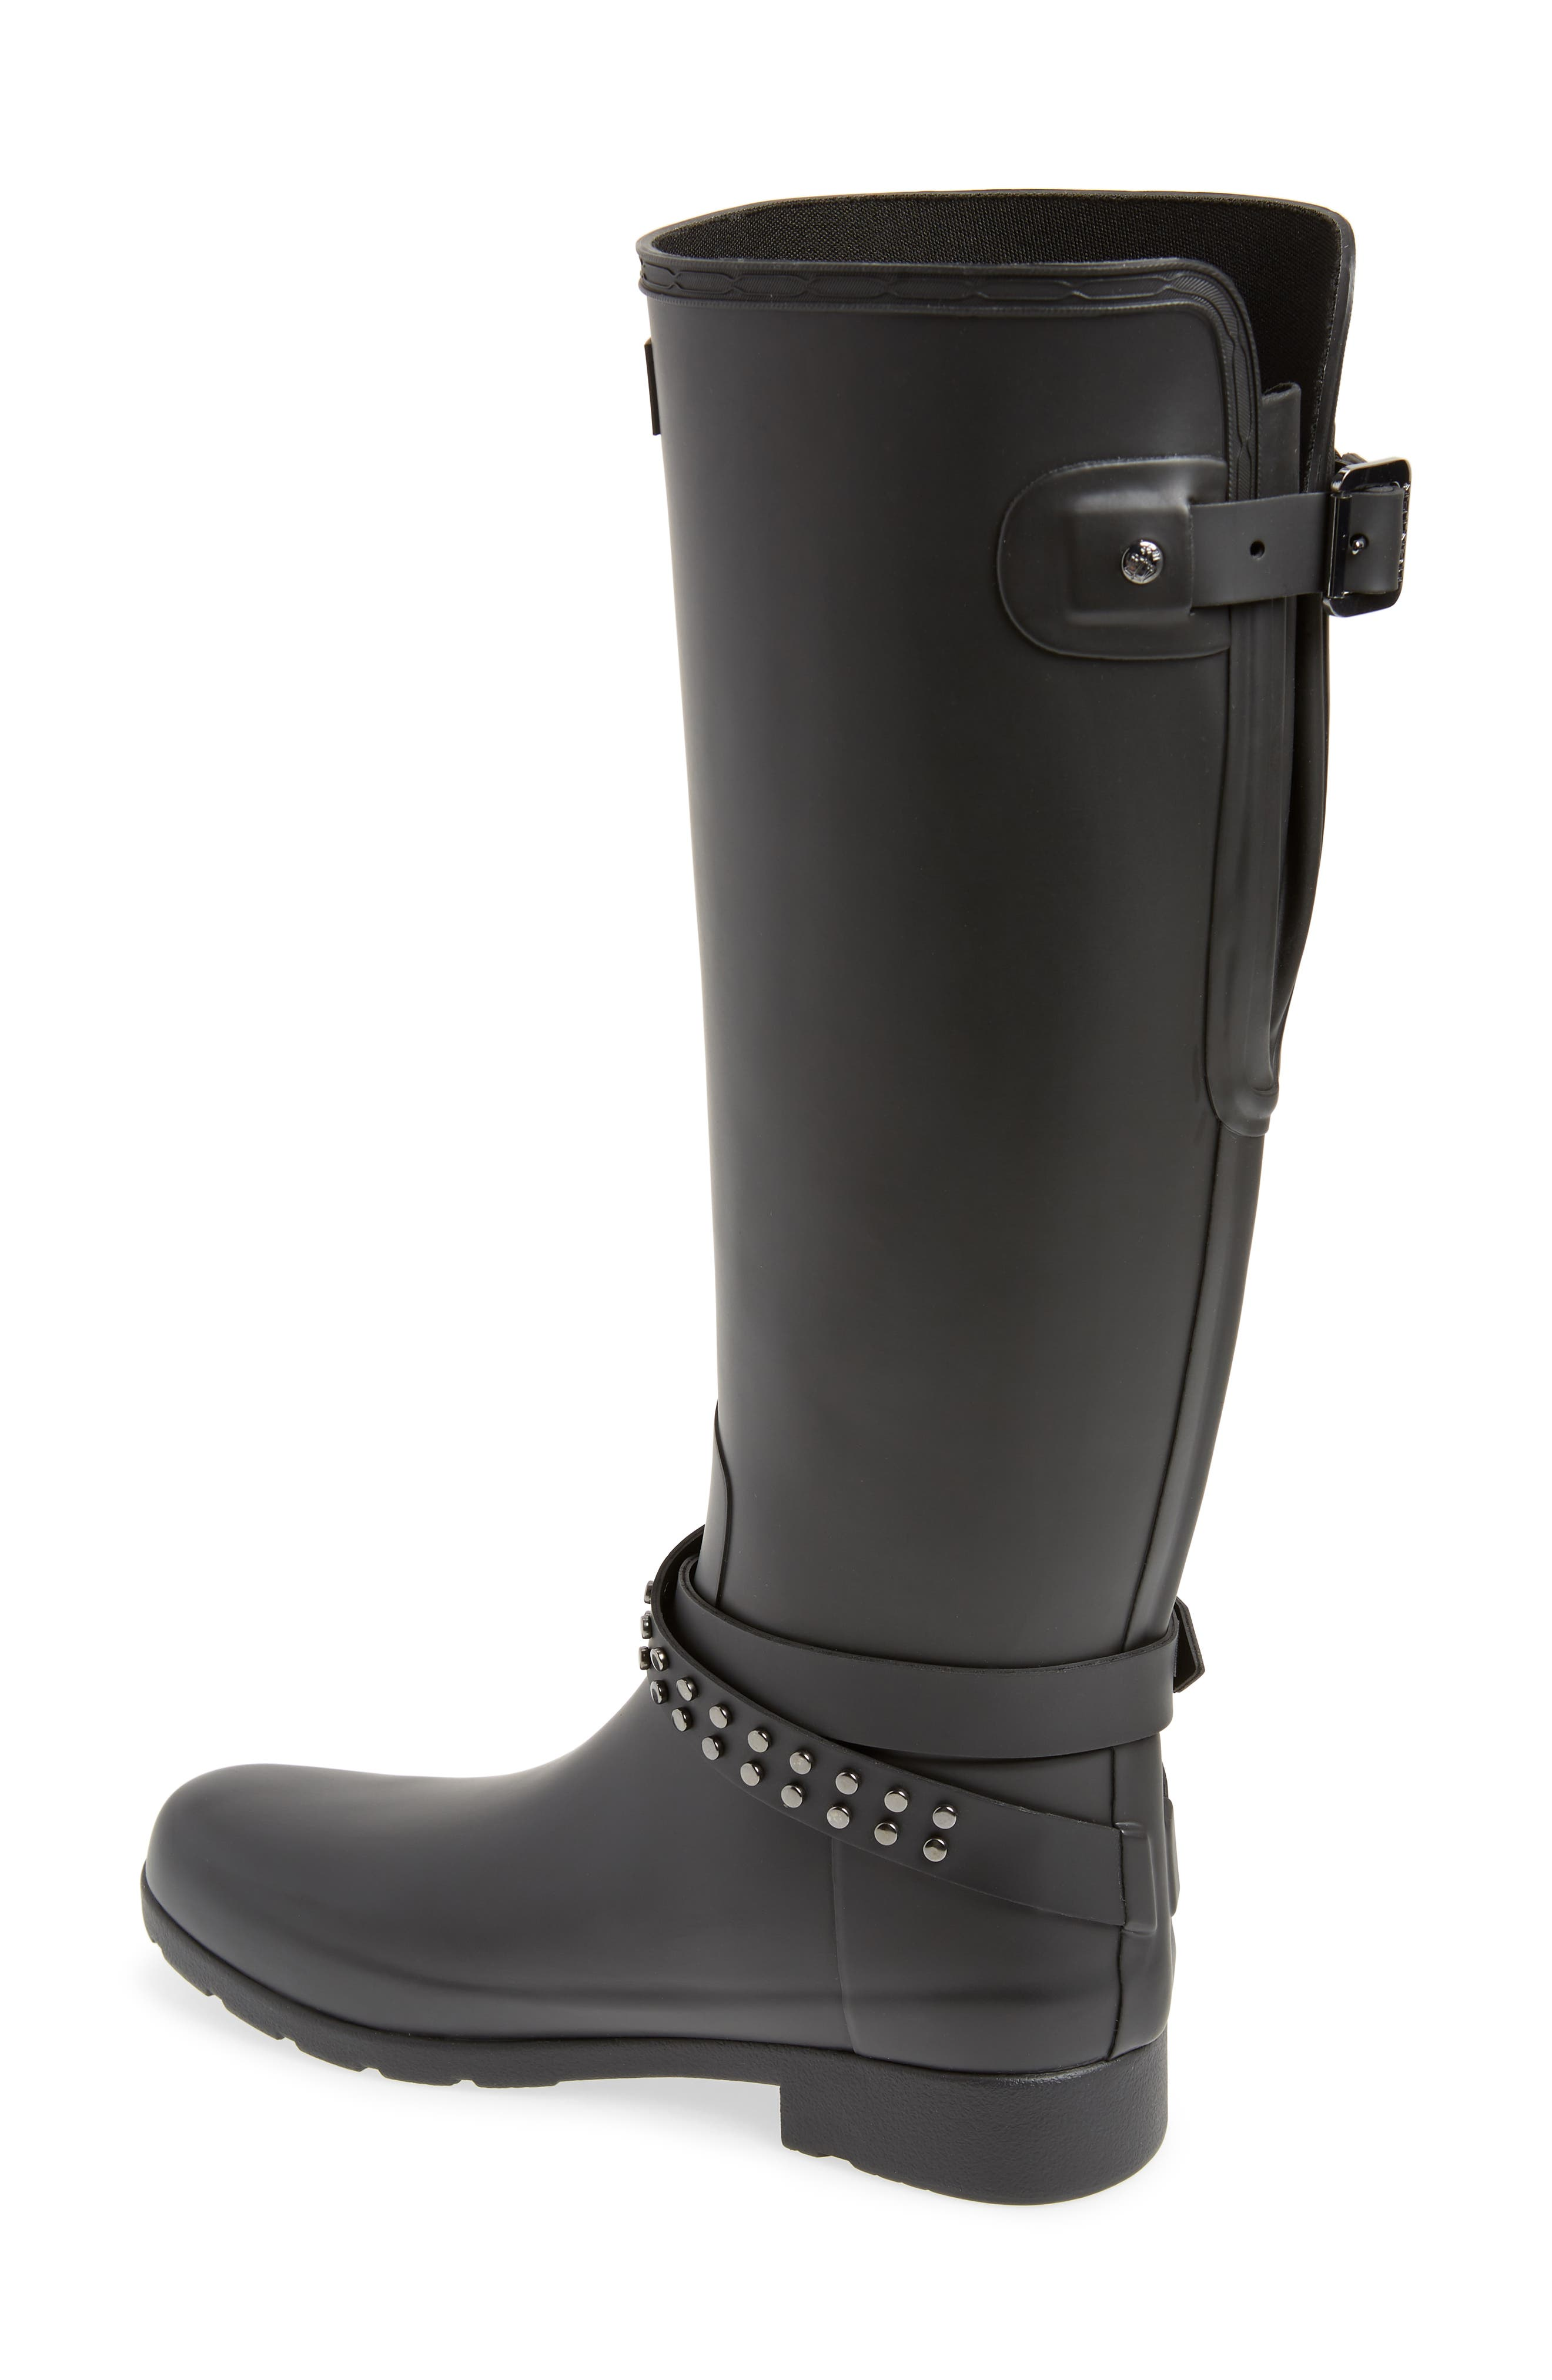 Refined Adjustable Back Knee High Rain Boot,                             Alternate thumbnail 2, color,                             BLACK